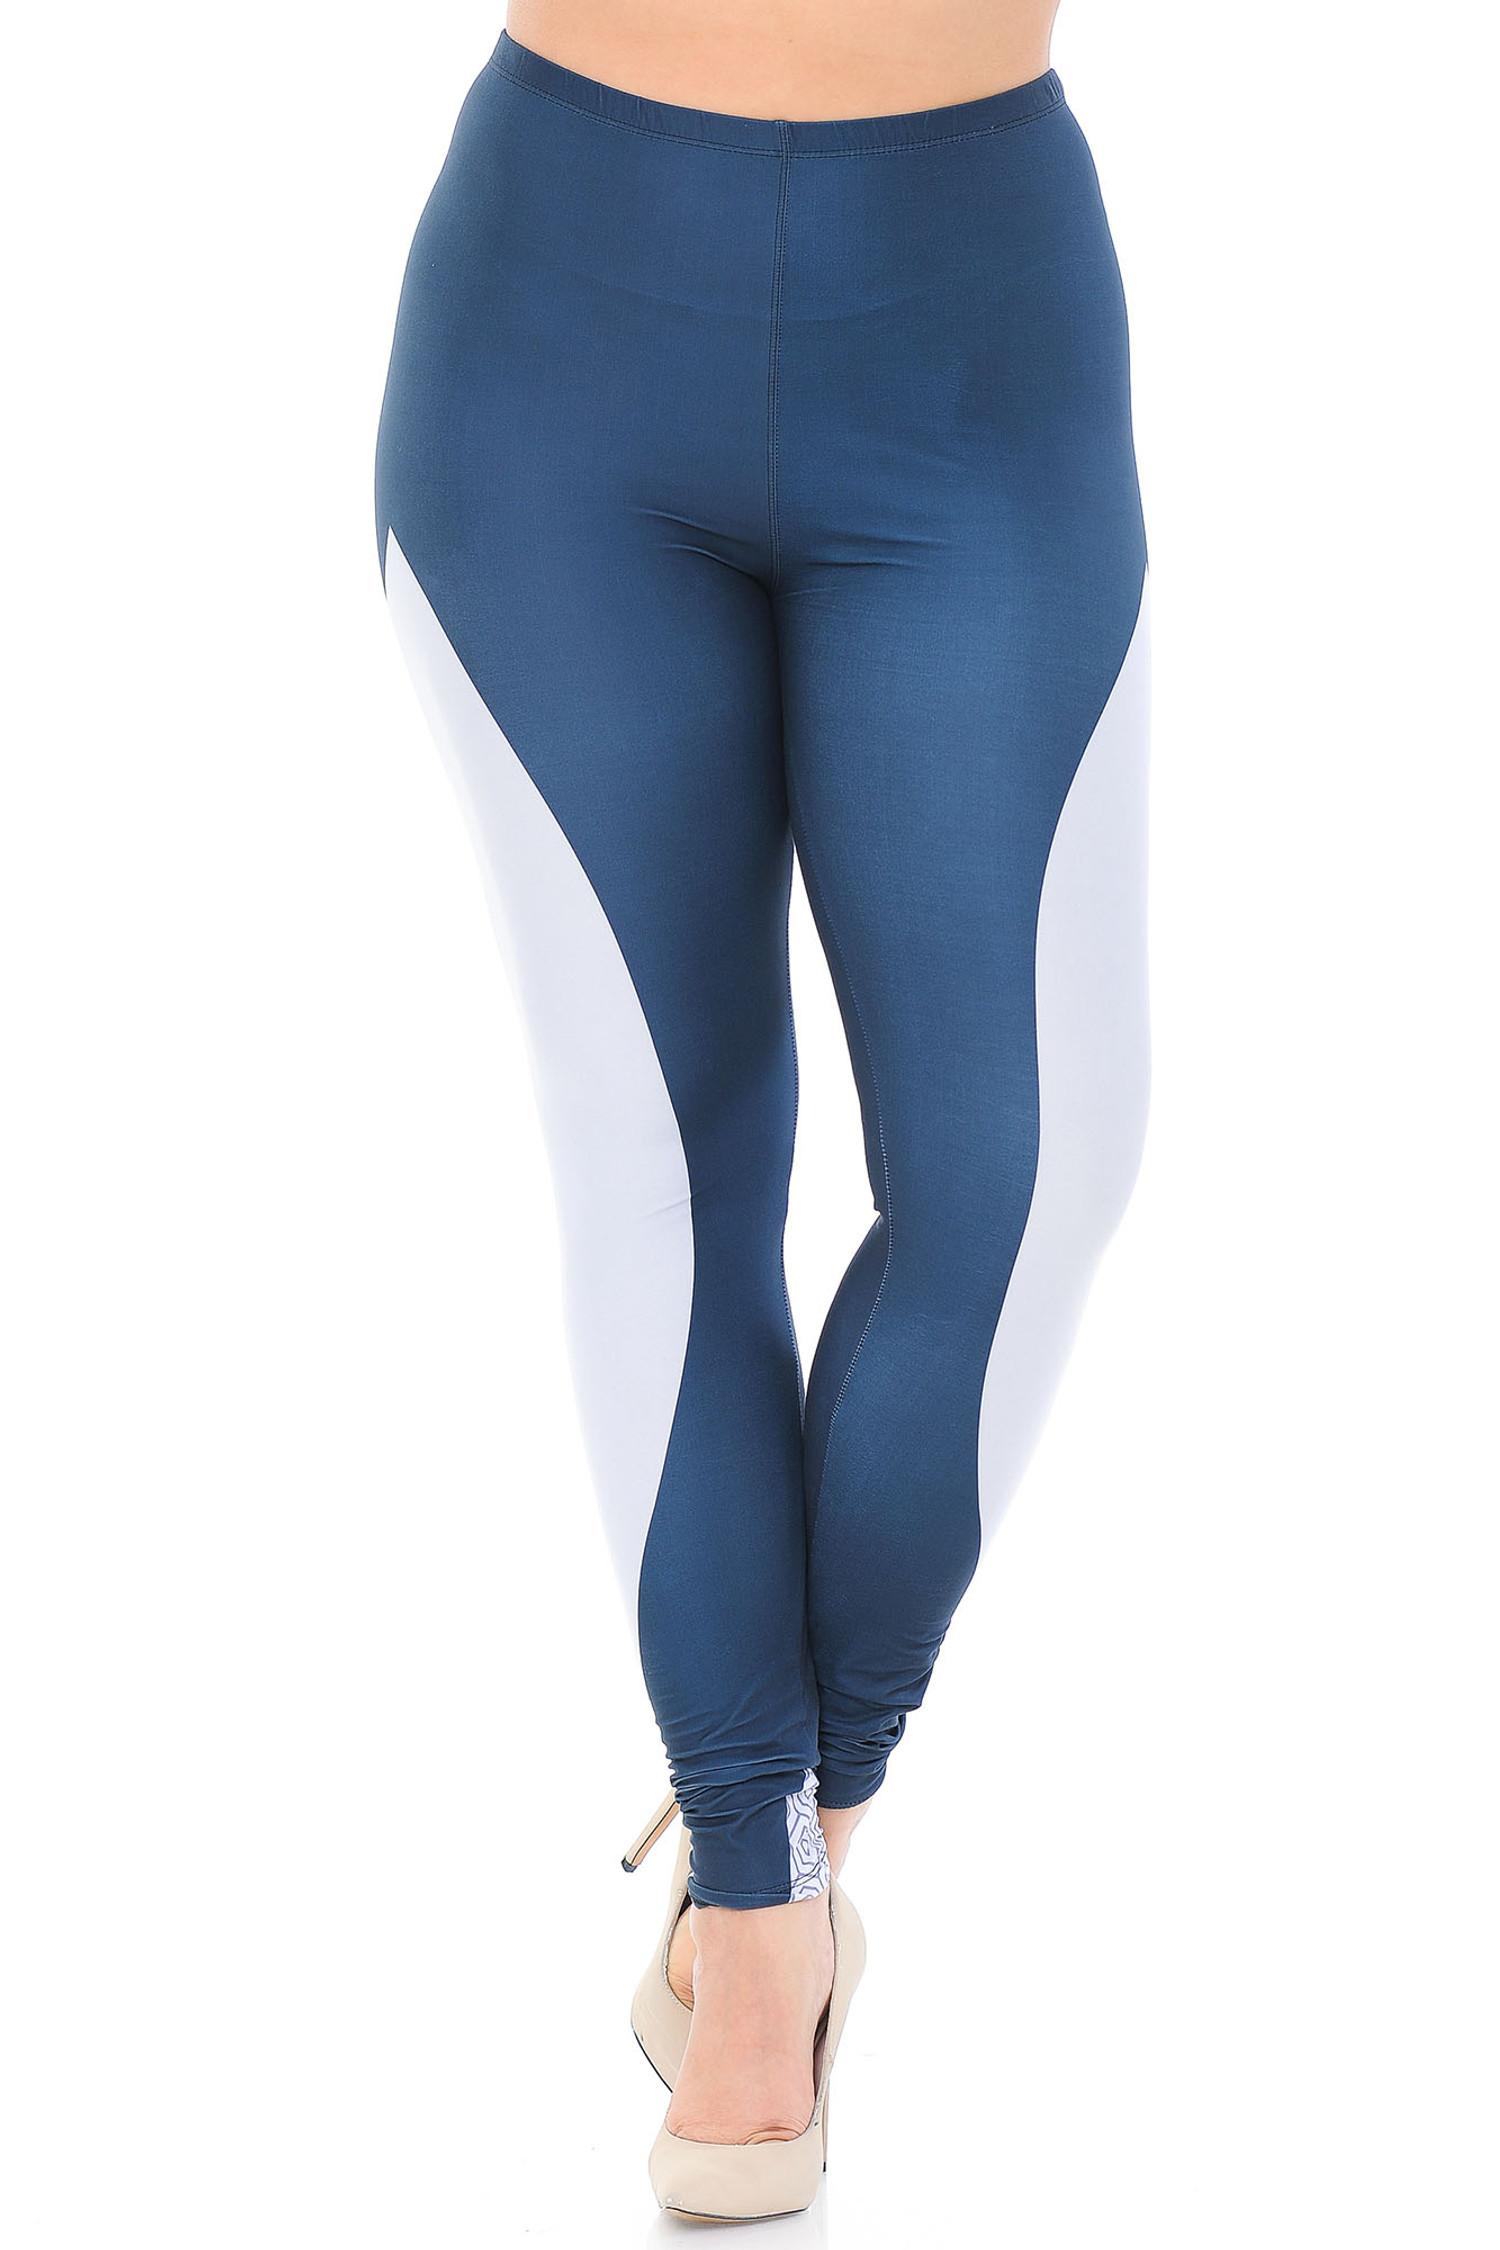 Creamy Soft Contour Curves Extra Plus Size Leggings - 3X-5X - USA Fashion™